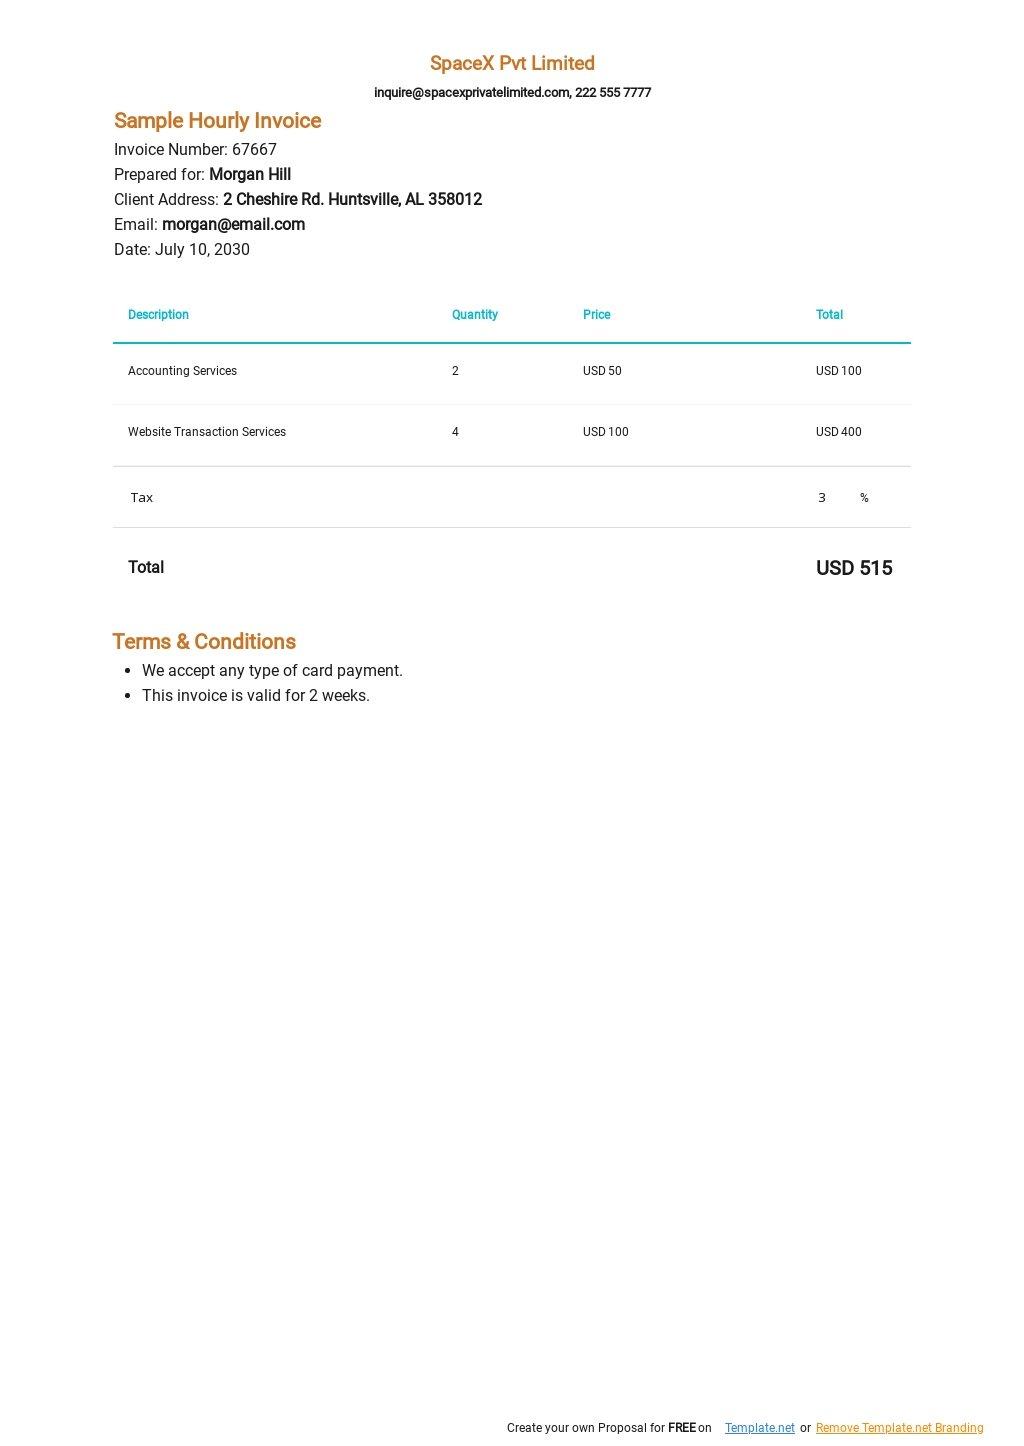 Sample Hourly Invoice Template.jpe